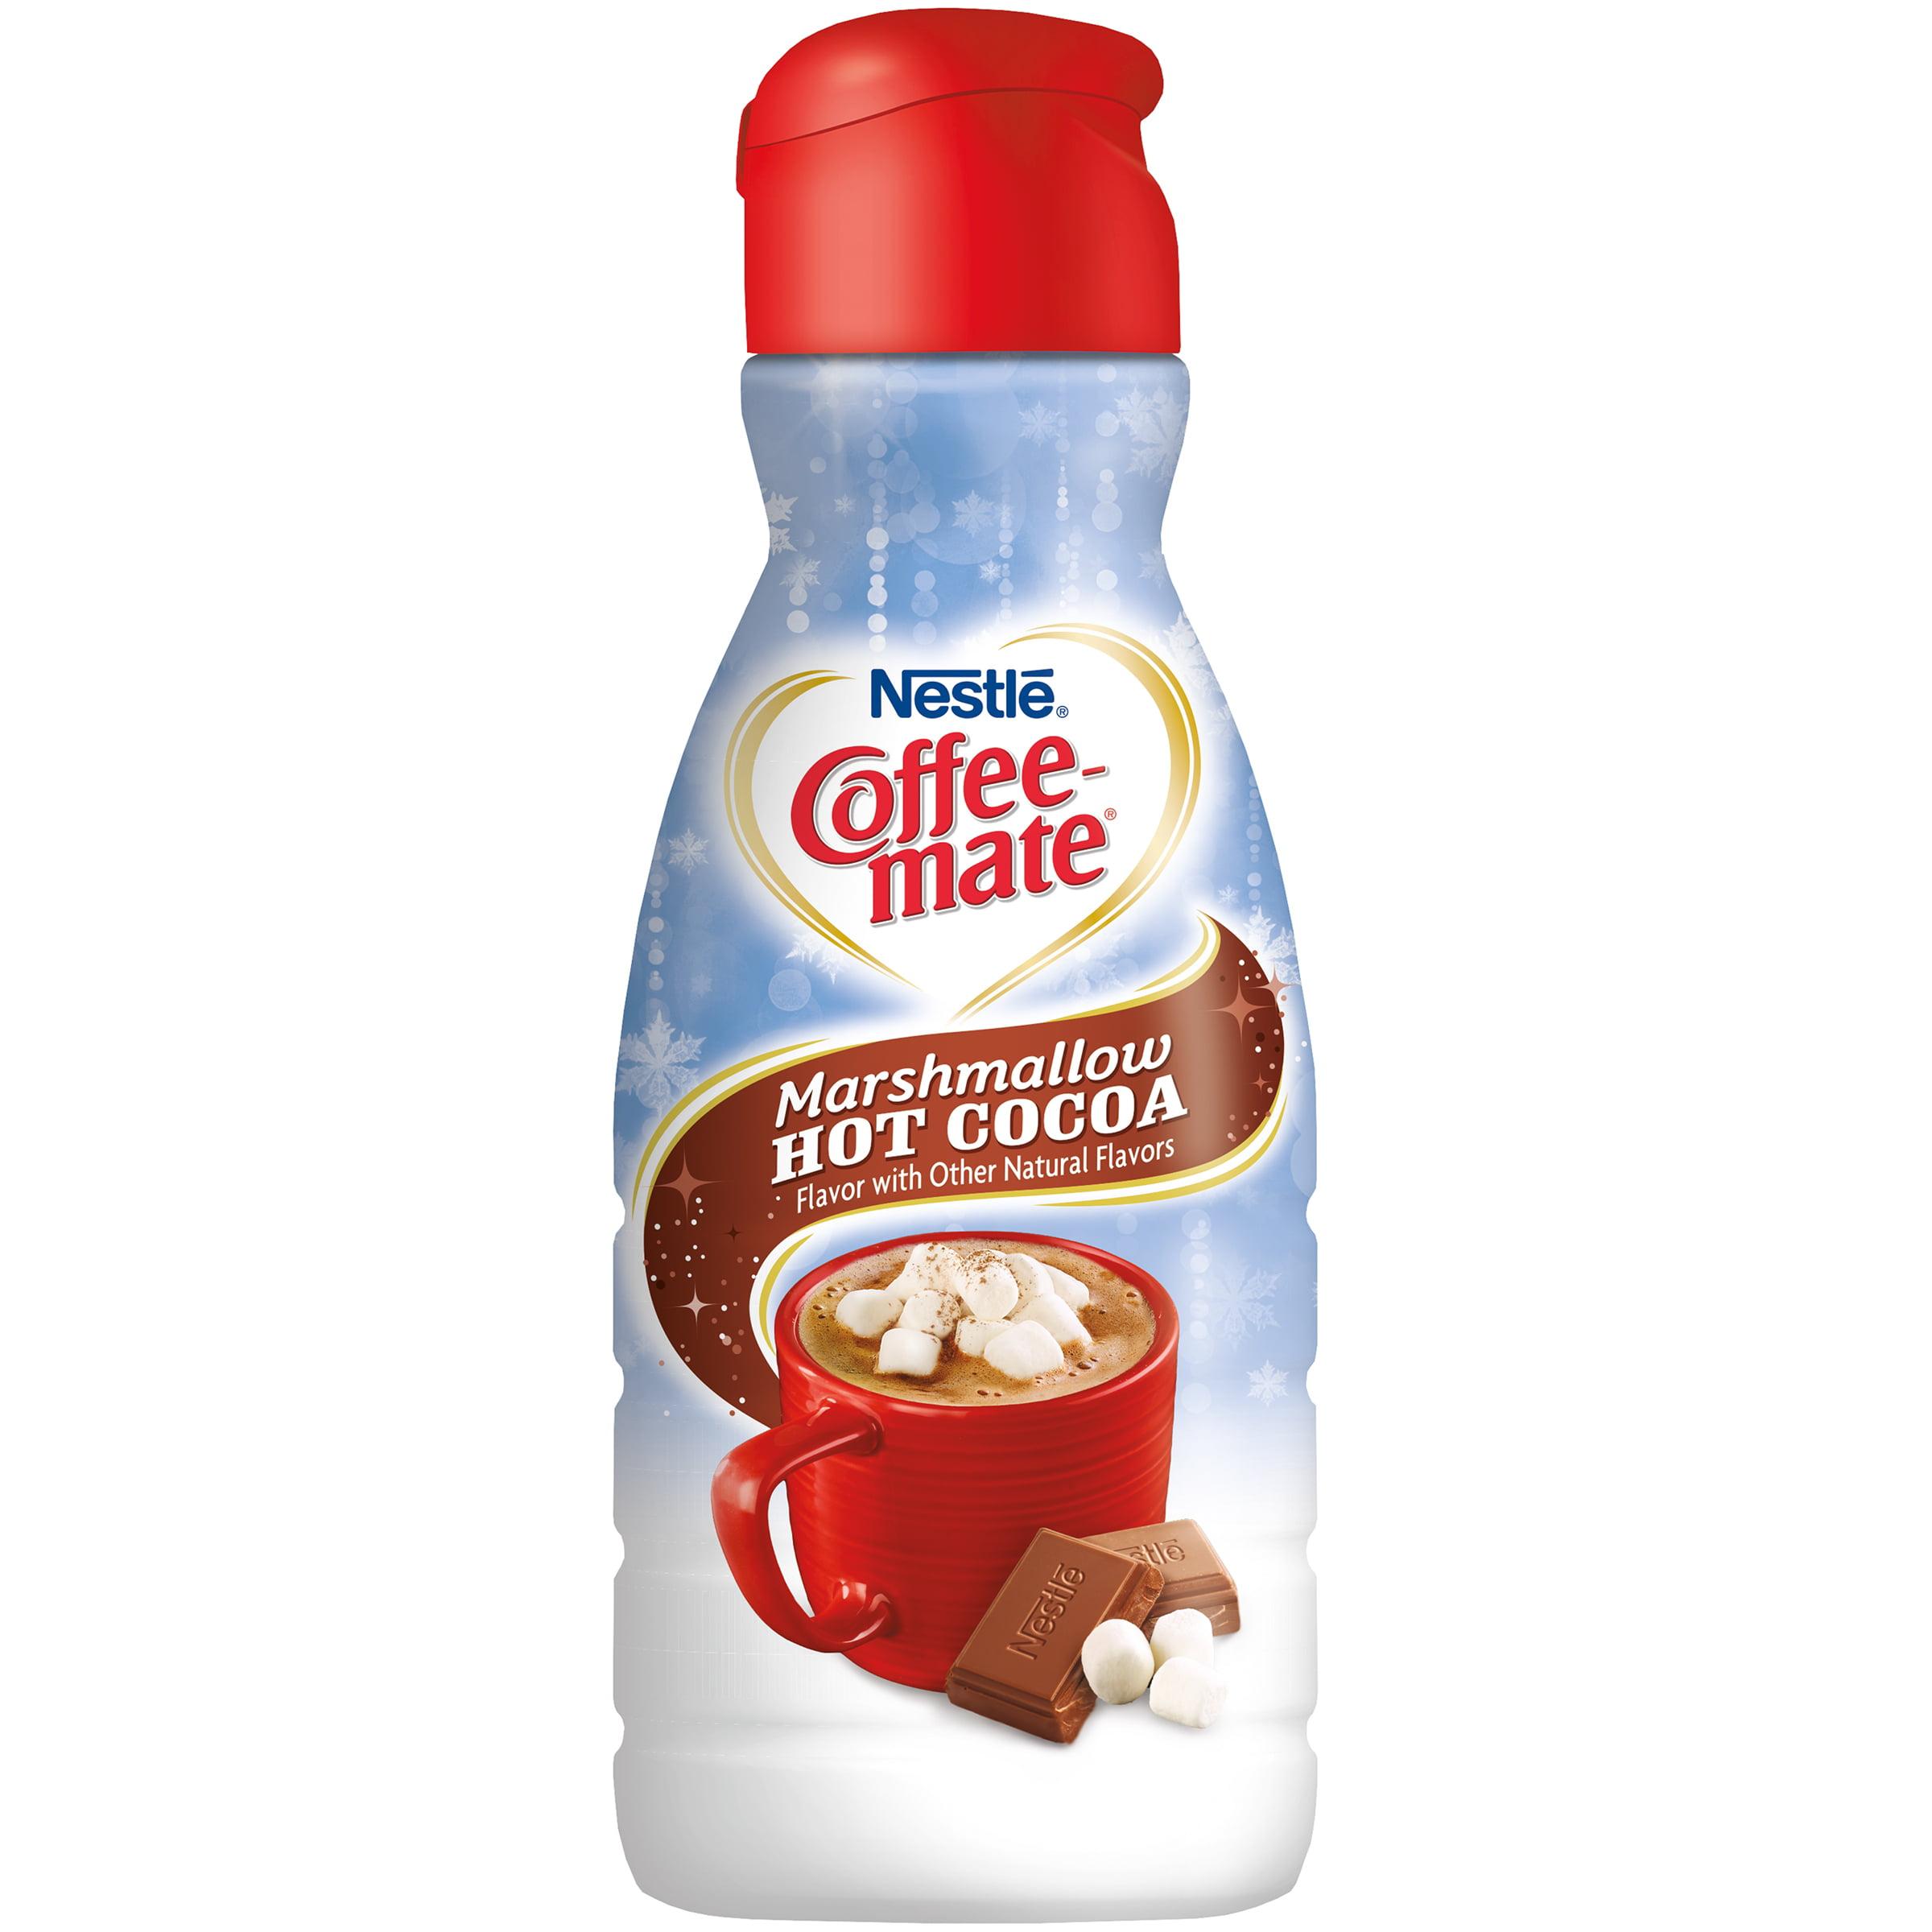 COFFEE-MATE Marshmallow Hot Cocoa Liquid Coffee Creamer 32 ...